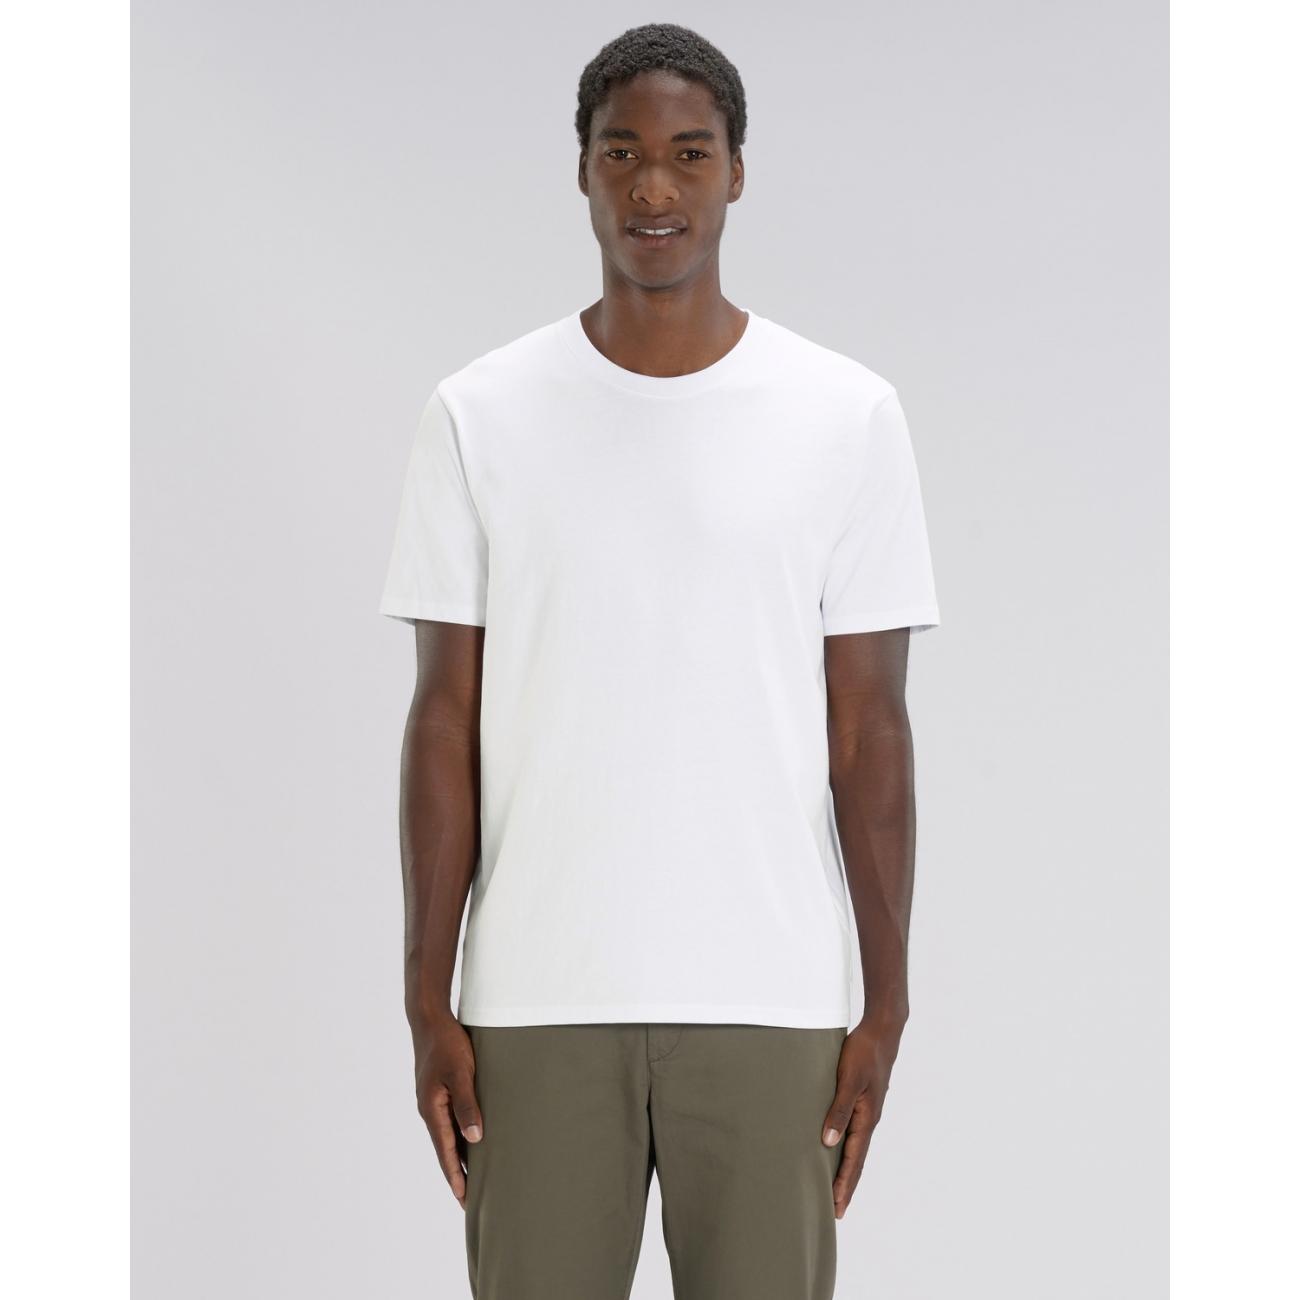 https://tee-shirt-bio.com/7833-thickbox_default/tee-shirt-homme-epais-220g-coton-bio-blanc-sparker.jpg